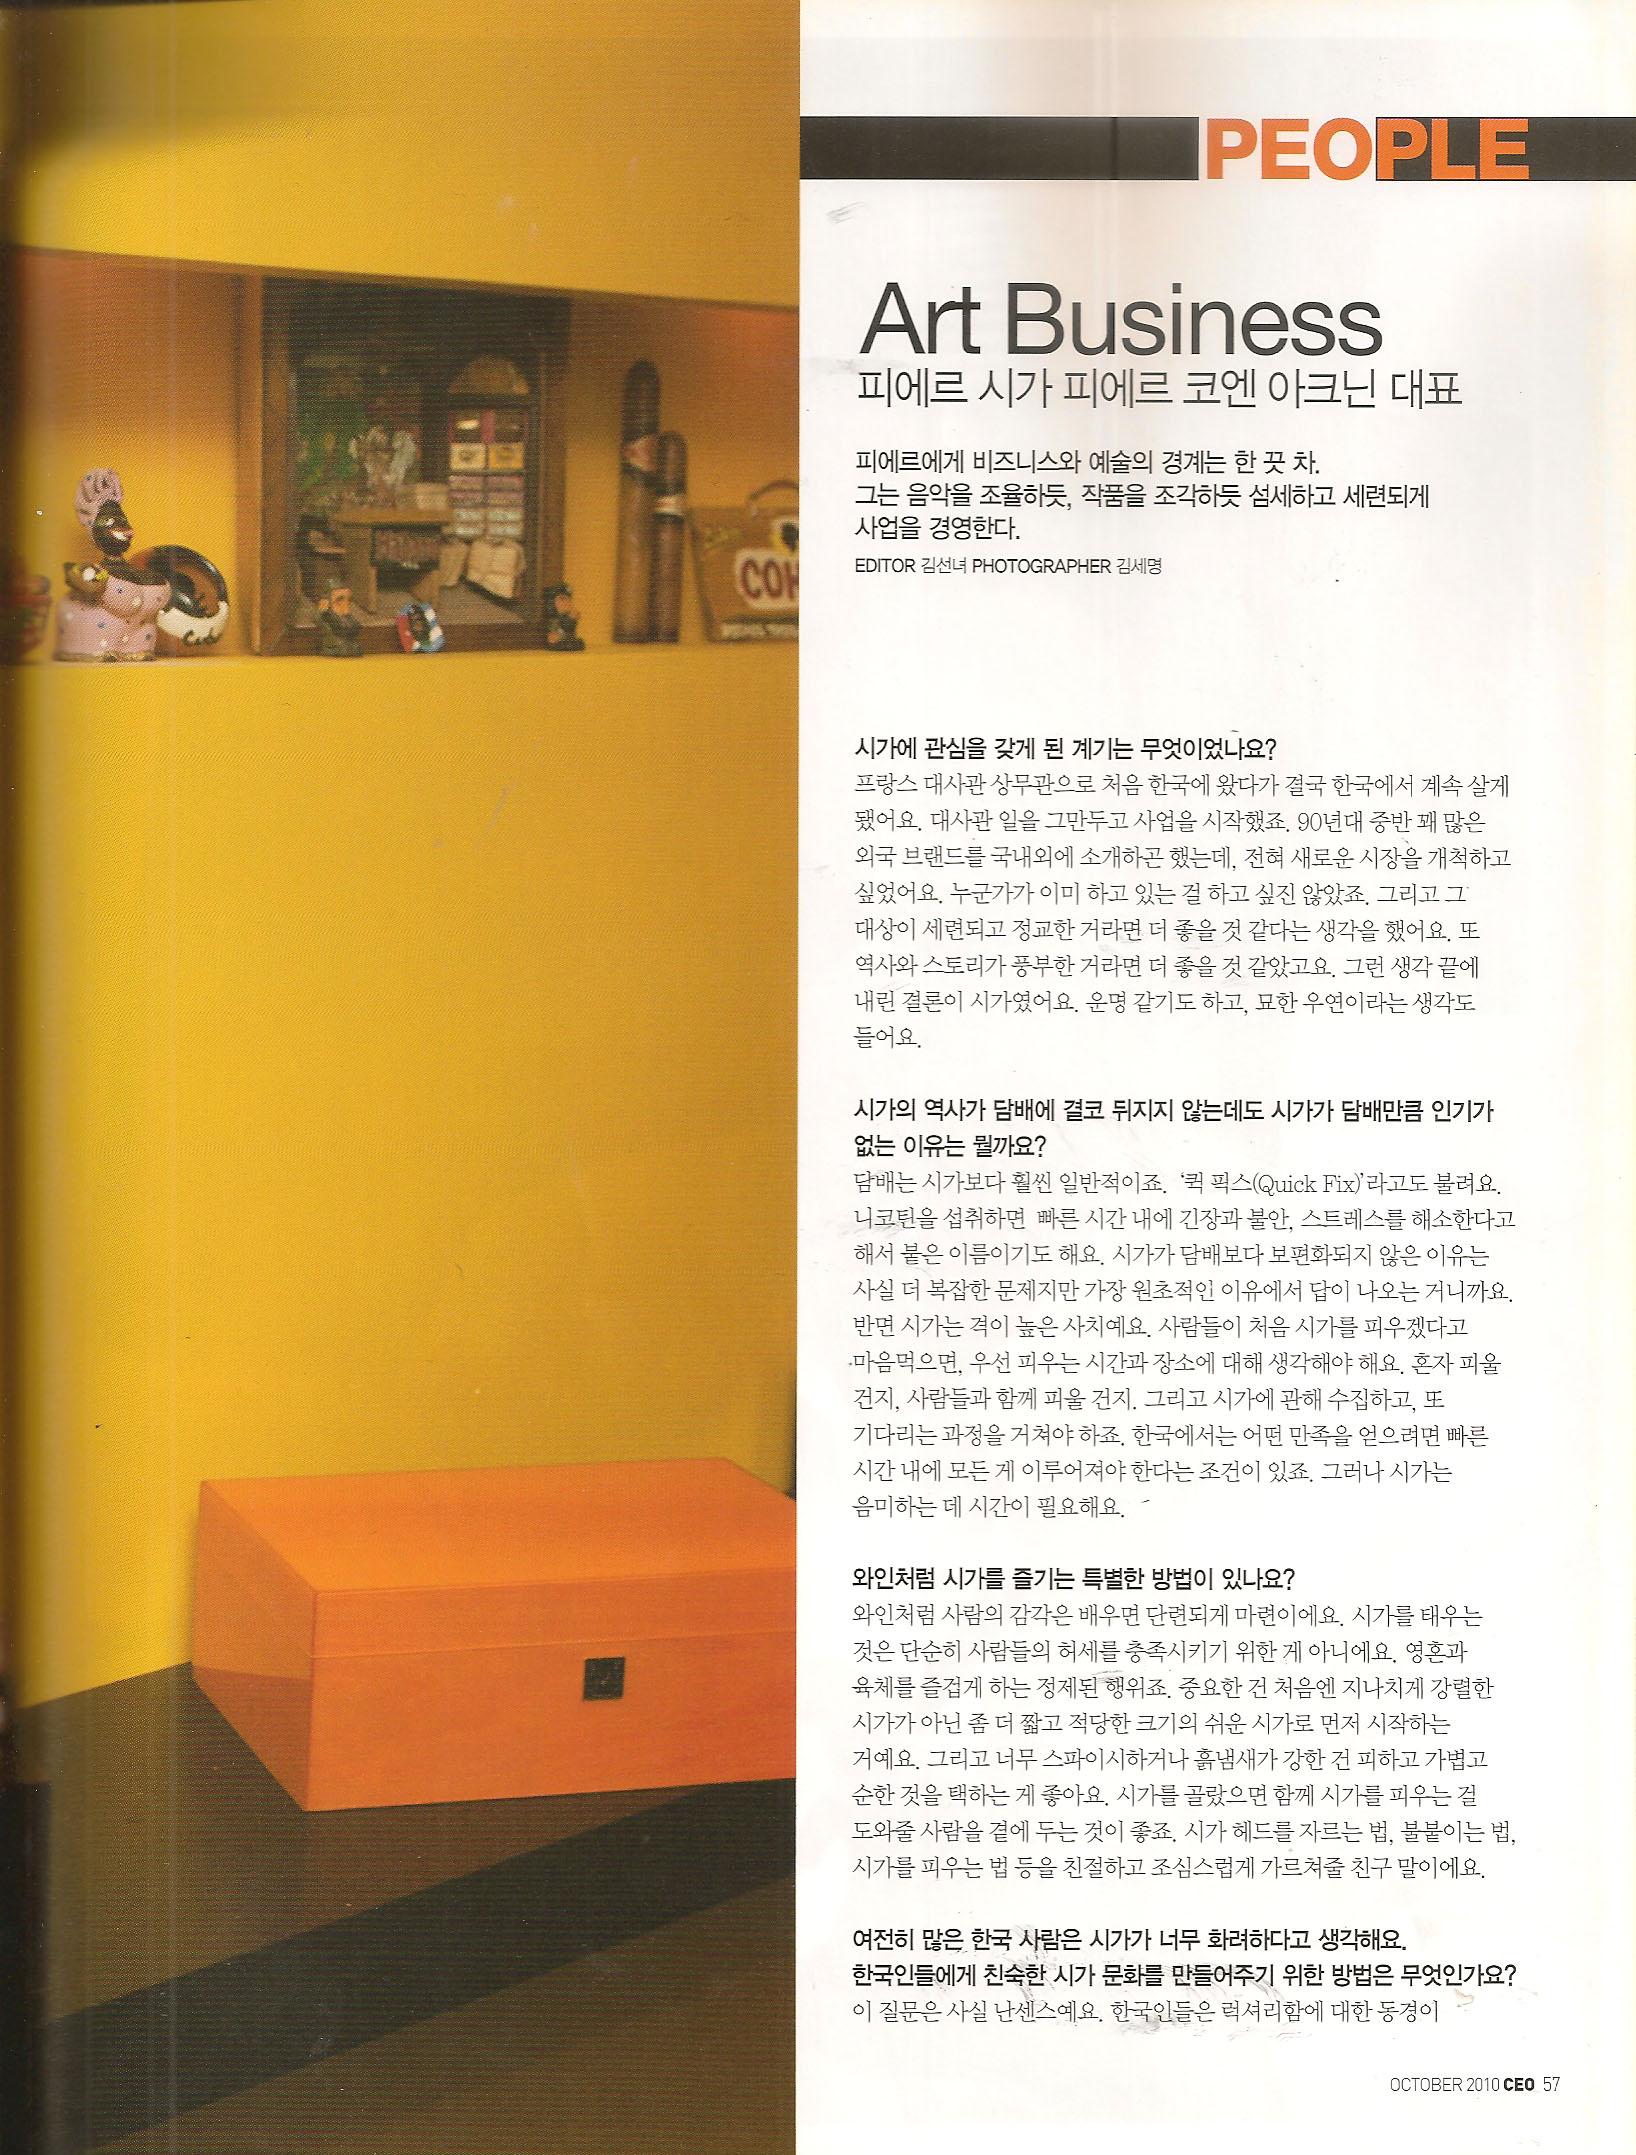 2010-10 CEO article2.jpg